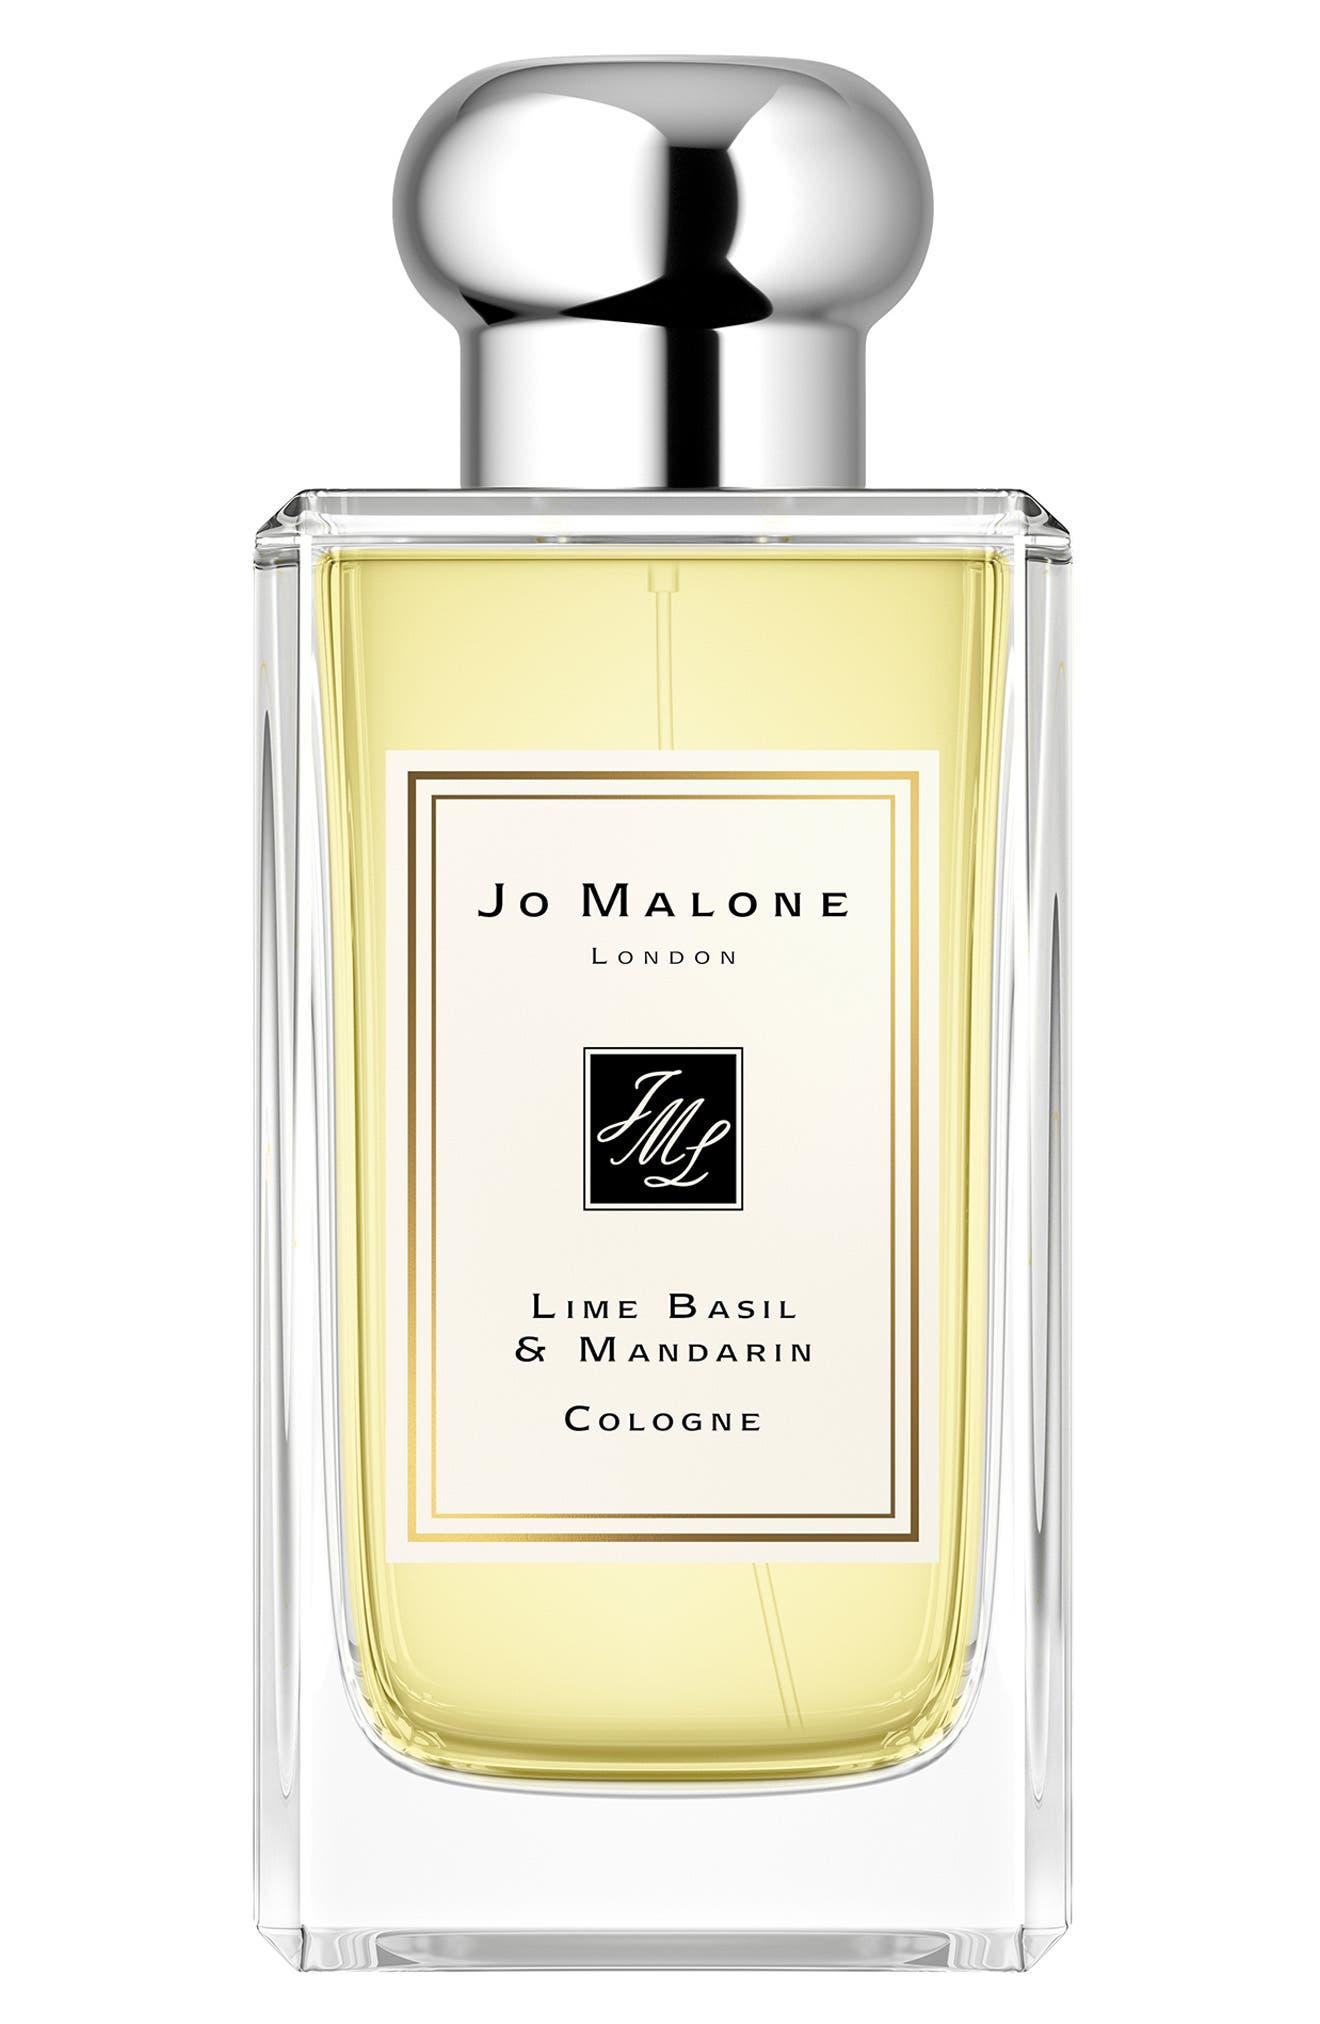 Jo Malone London(TM) Lime Basil & Mandarin Cologne